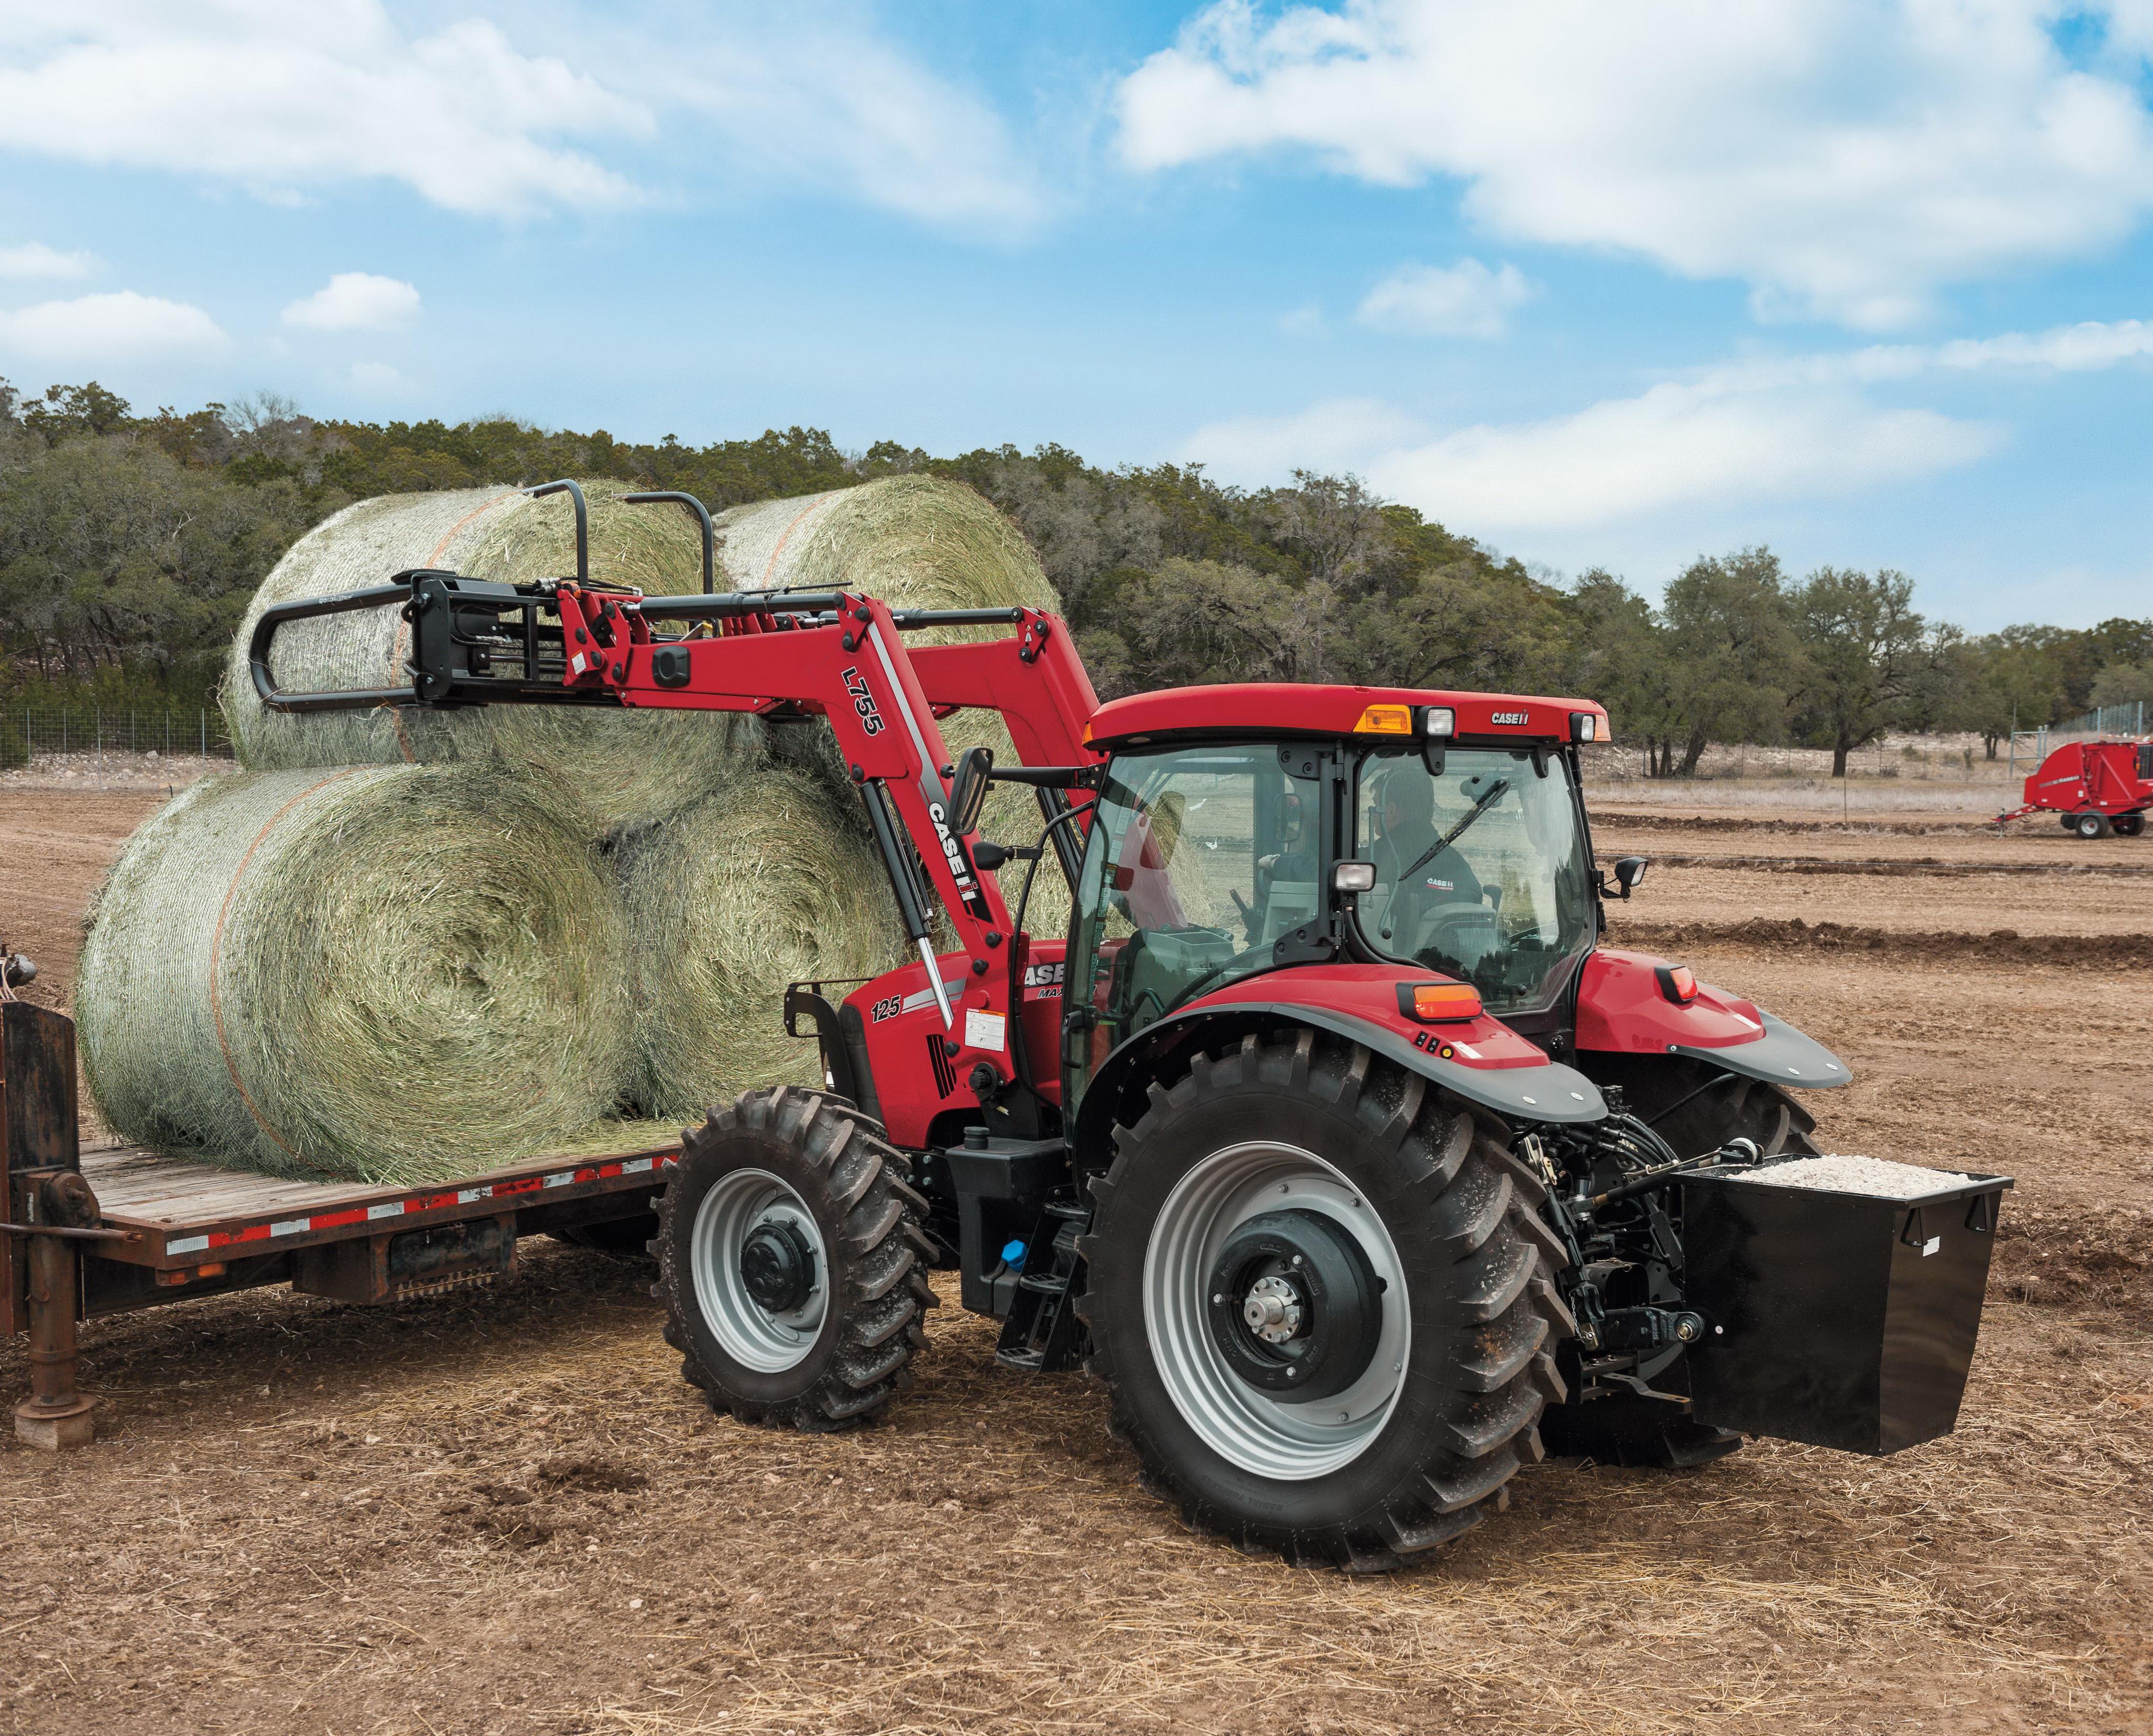 4096x3303,田地,农机,2009-15 Case IH Maxxum 125,乾草,拖拉机,农业机器,,